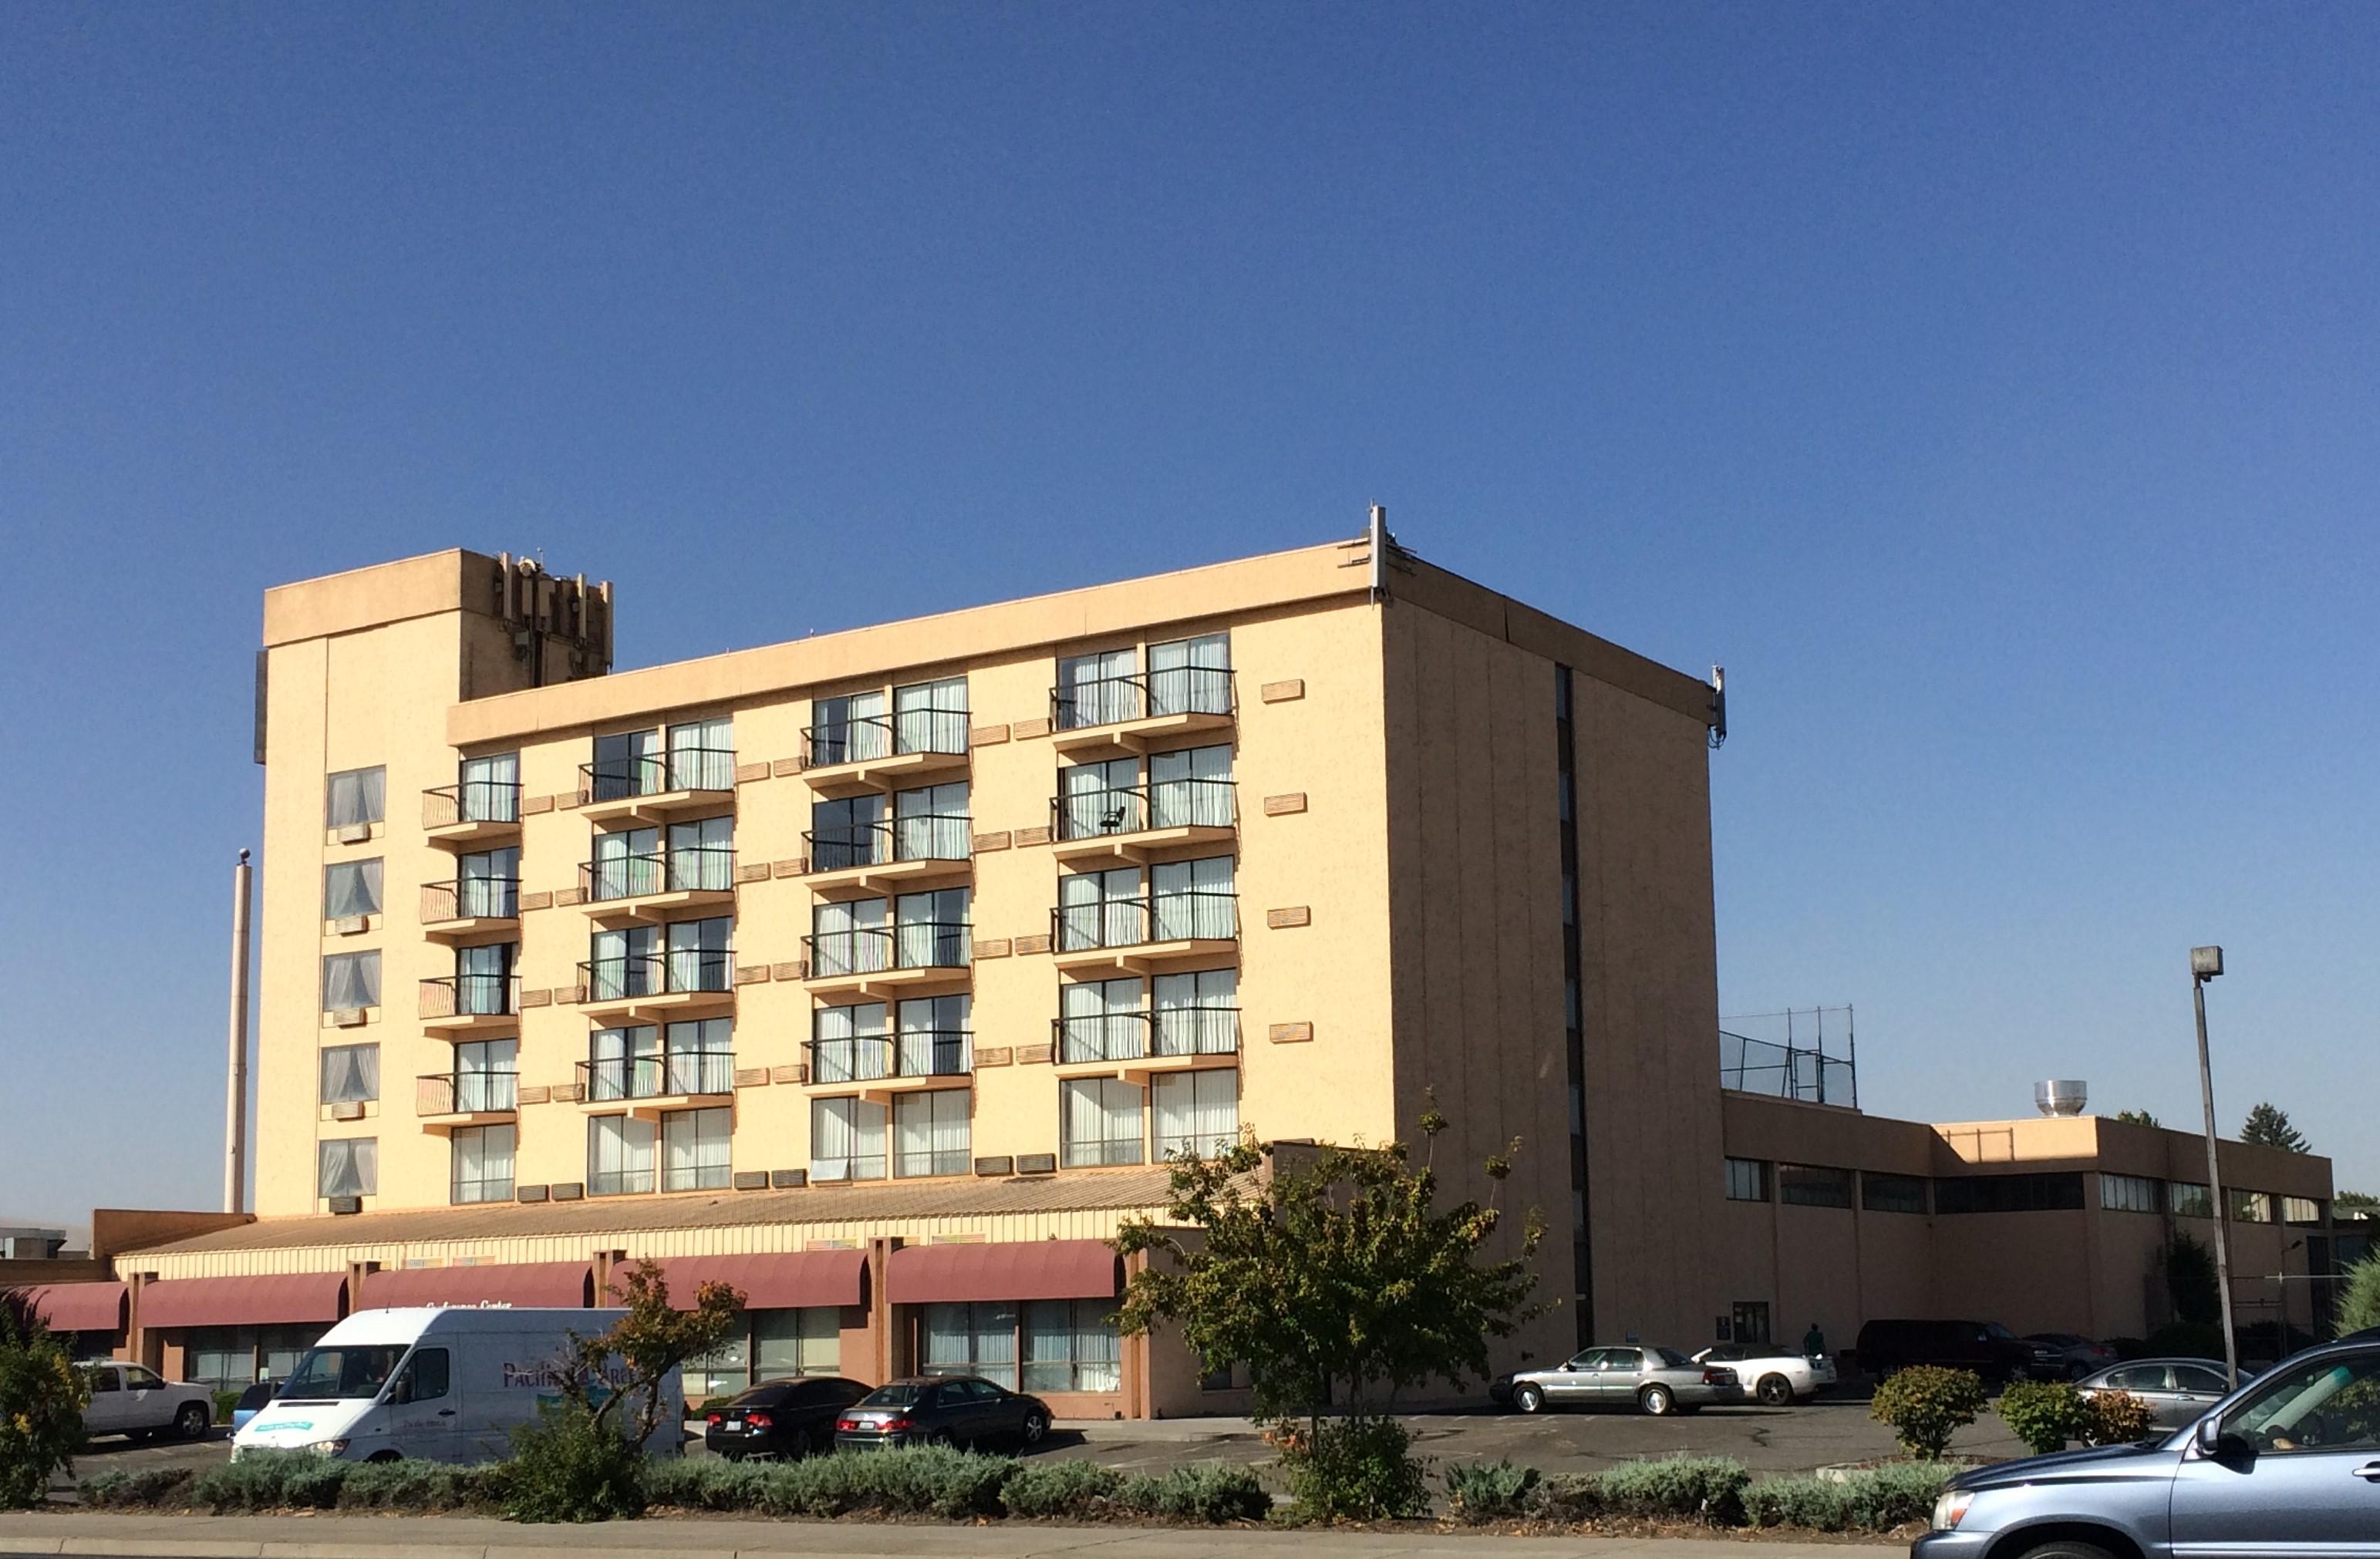 File M Hotel And Conference Center Richland Washington Jpg